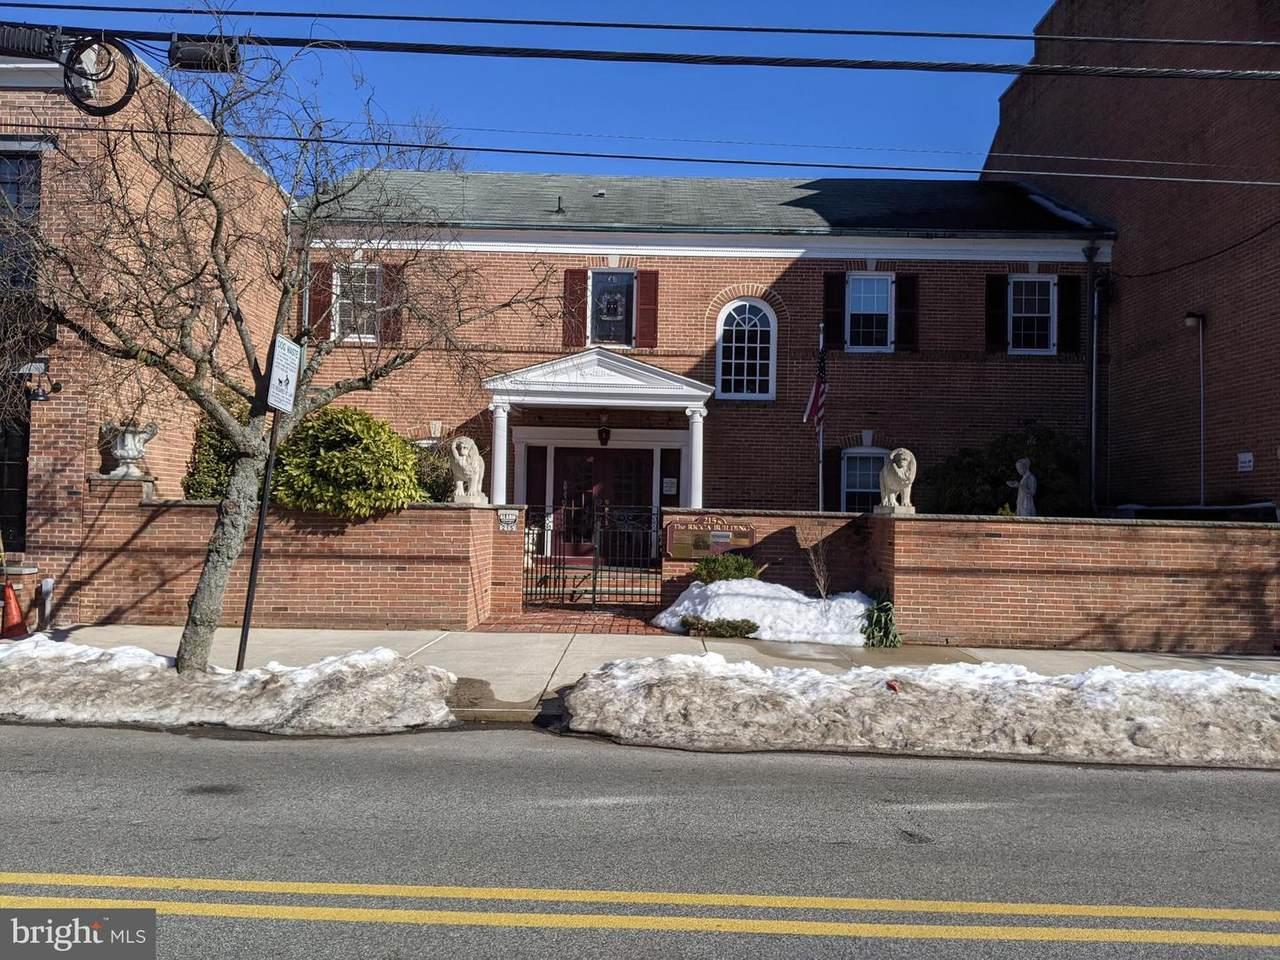 215 Olive Street - Photo 1